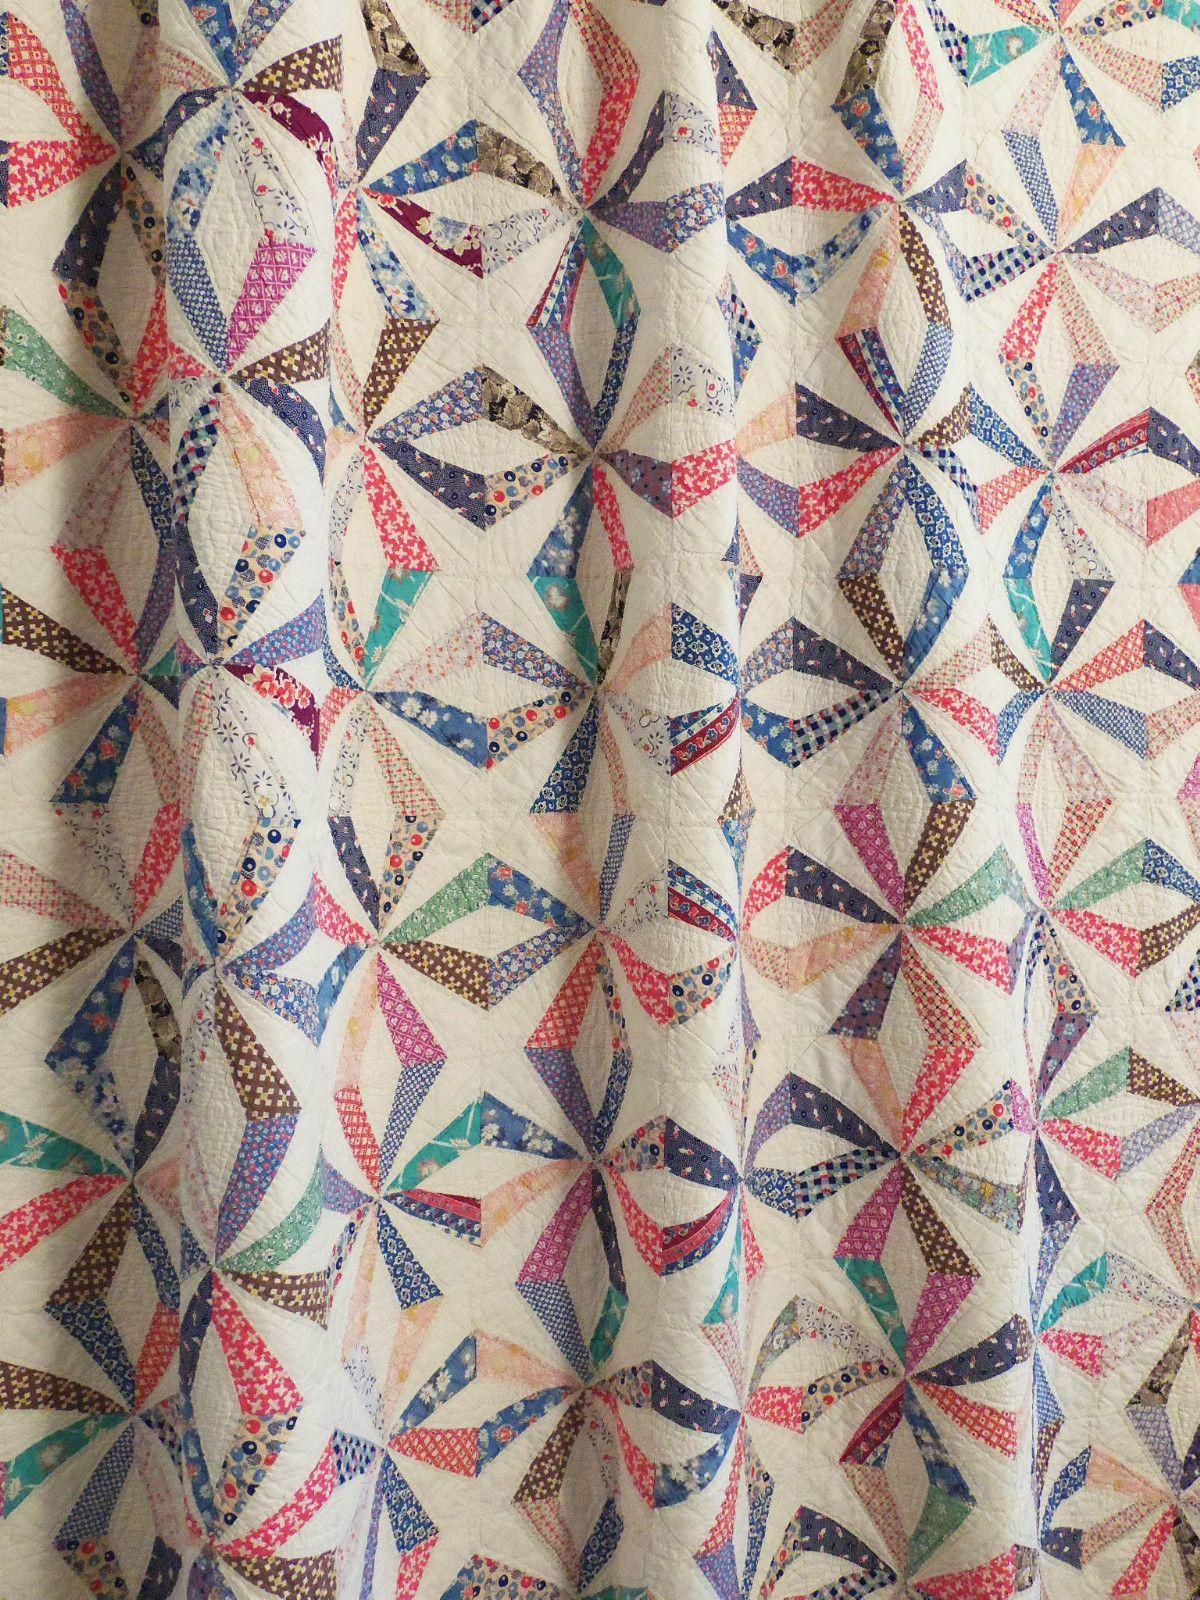 Vintage Handmade Quilt 1930s Endless Chain Maltese Cross W